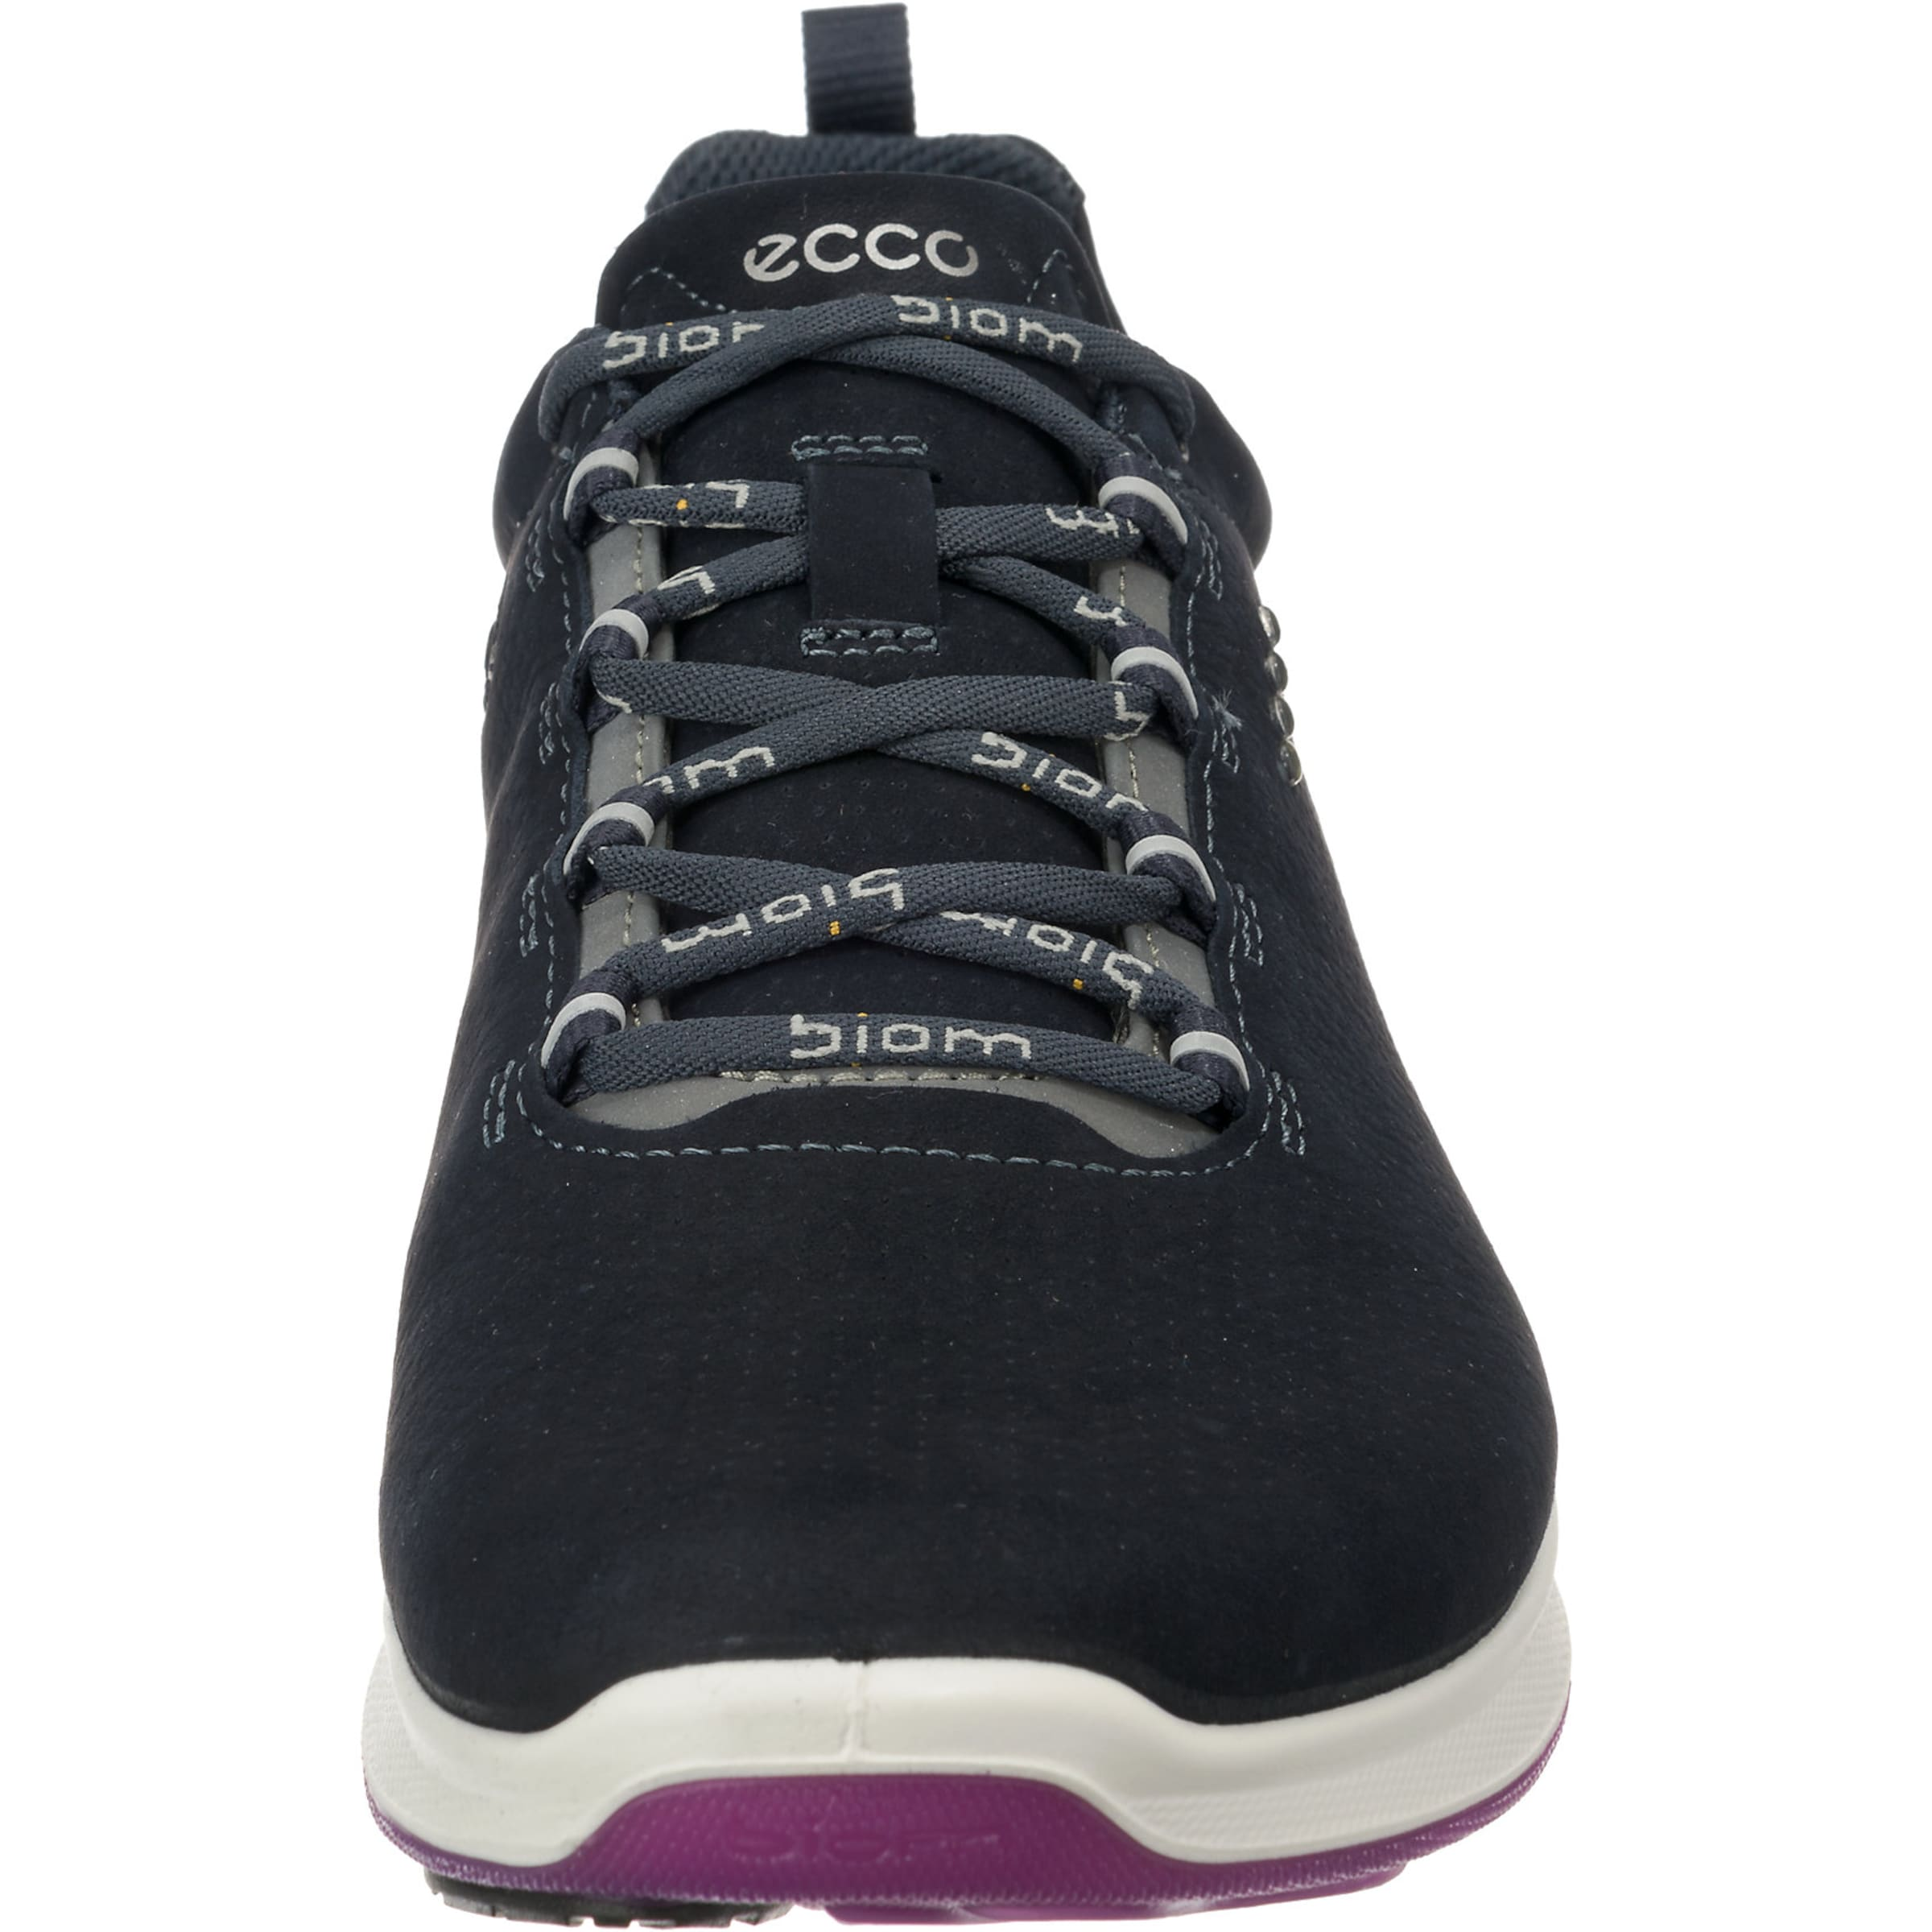 Ecco Sneakers Yak' Navy In Fjuel Yabuck 'biom vfgyYb76